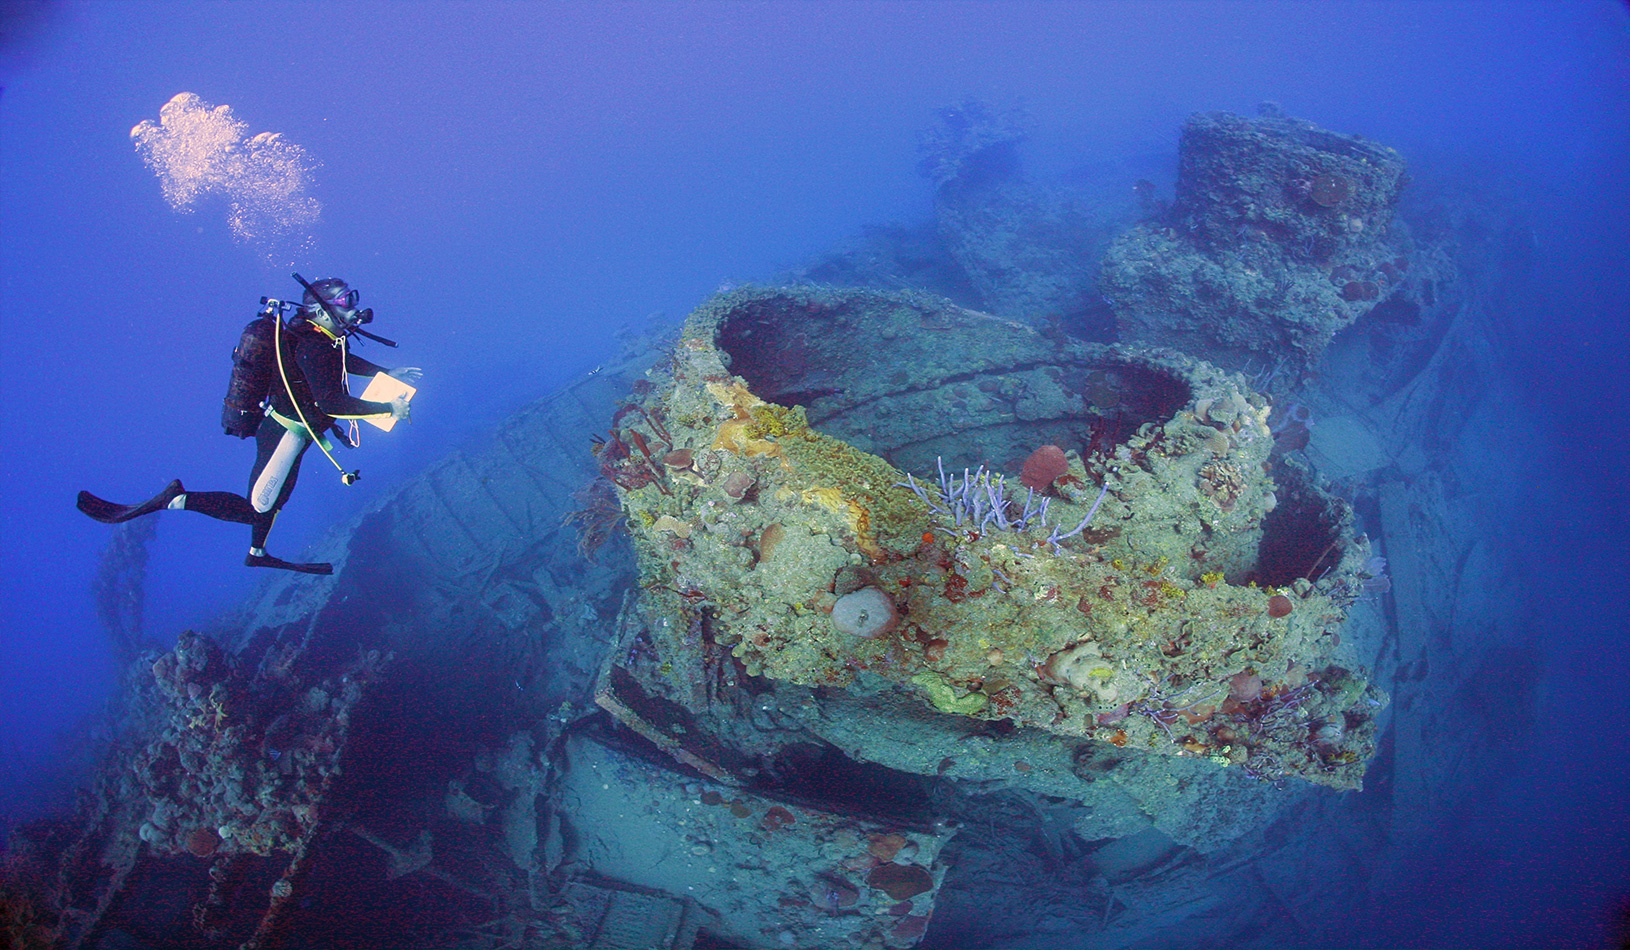 Jaruca-Sunken-Wreck-in-Playa-Larga